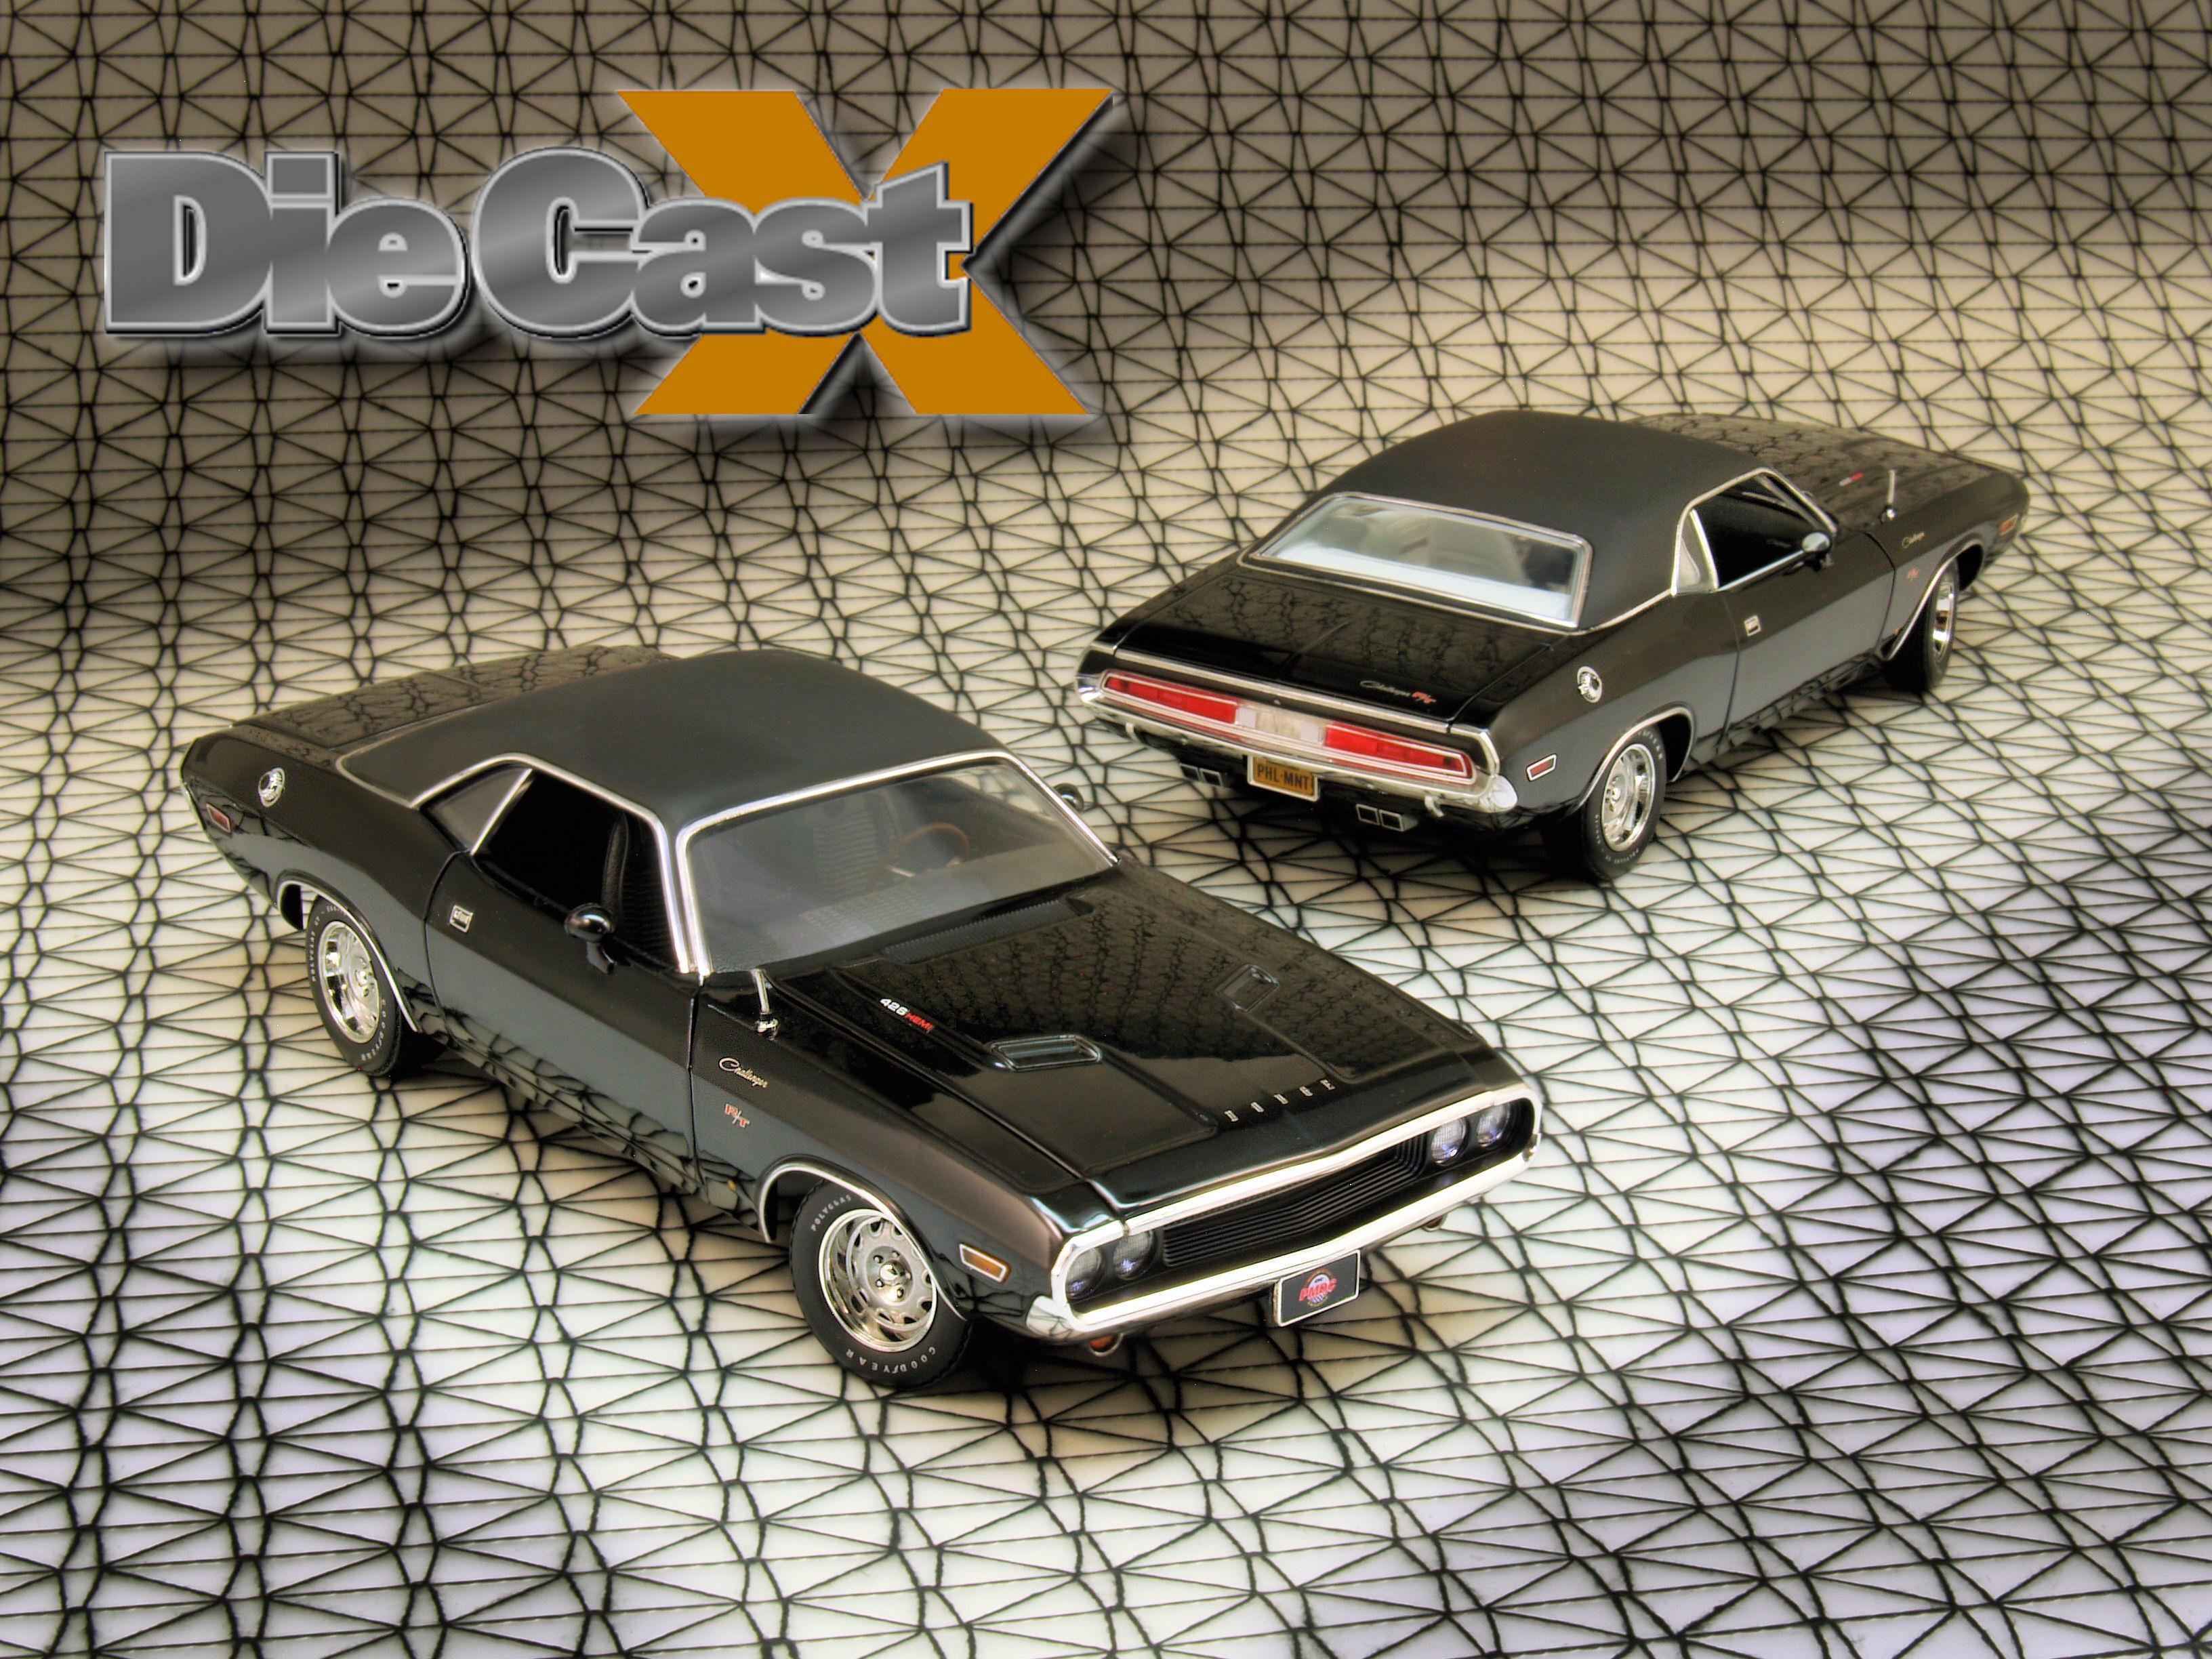 PhillyMint 1:24 1970 Hemi Challenger R/T: Basic, Black, and Badass